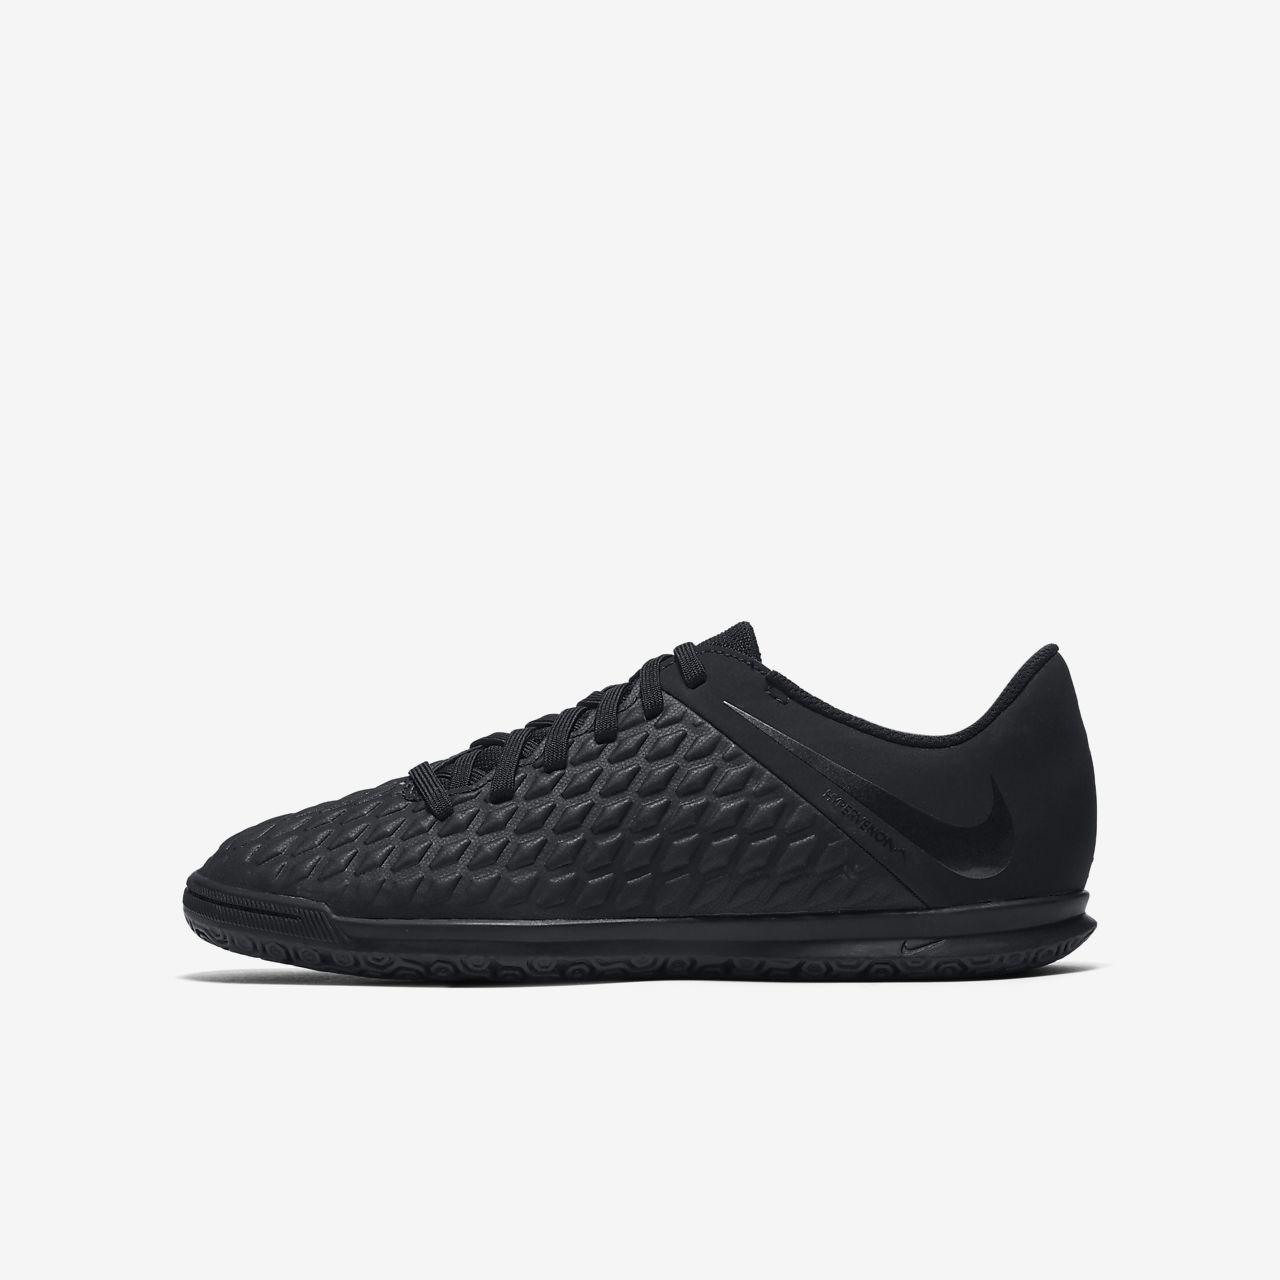 Nike HypervenomX Phantom III Club små IC fodboldsko til små Club store a0385d